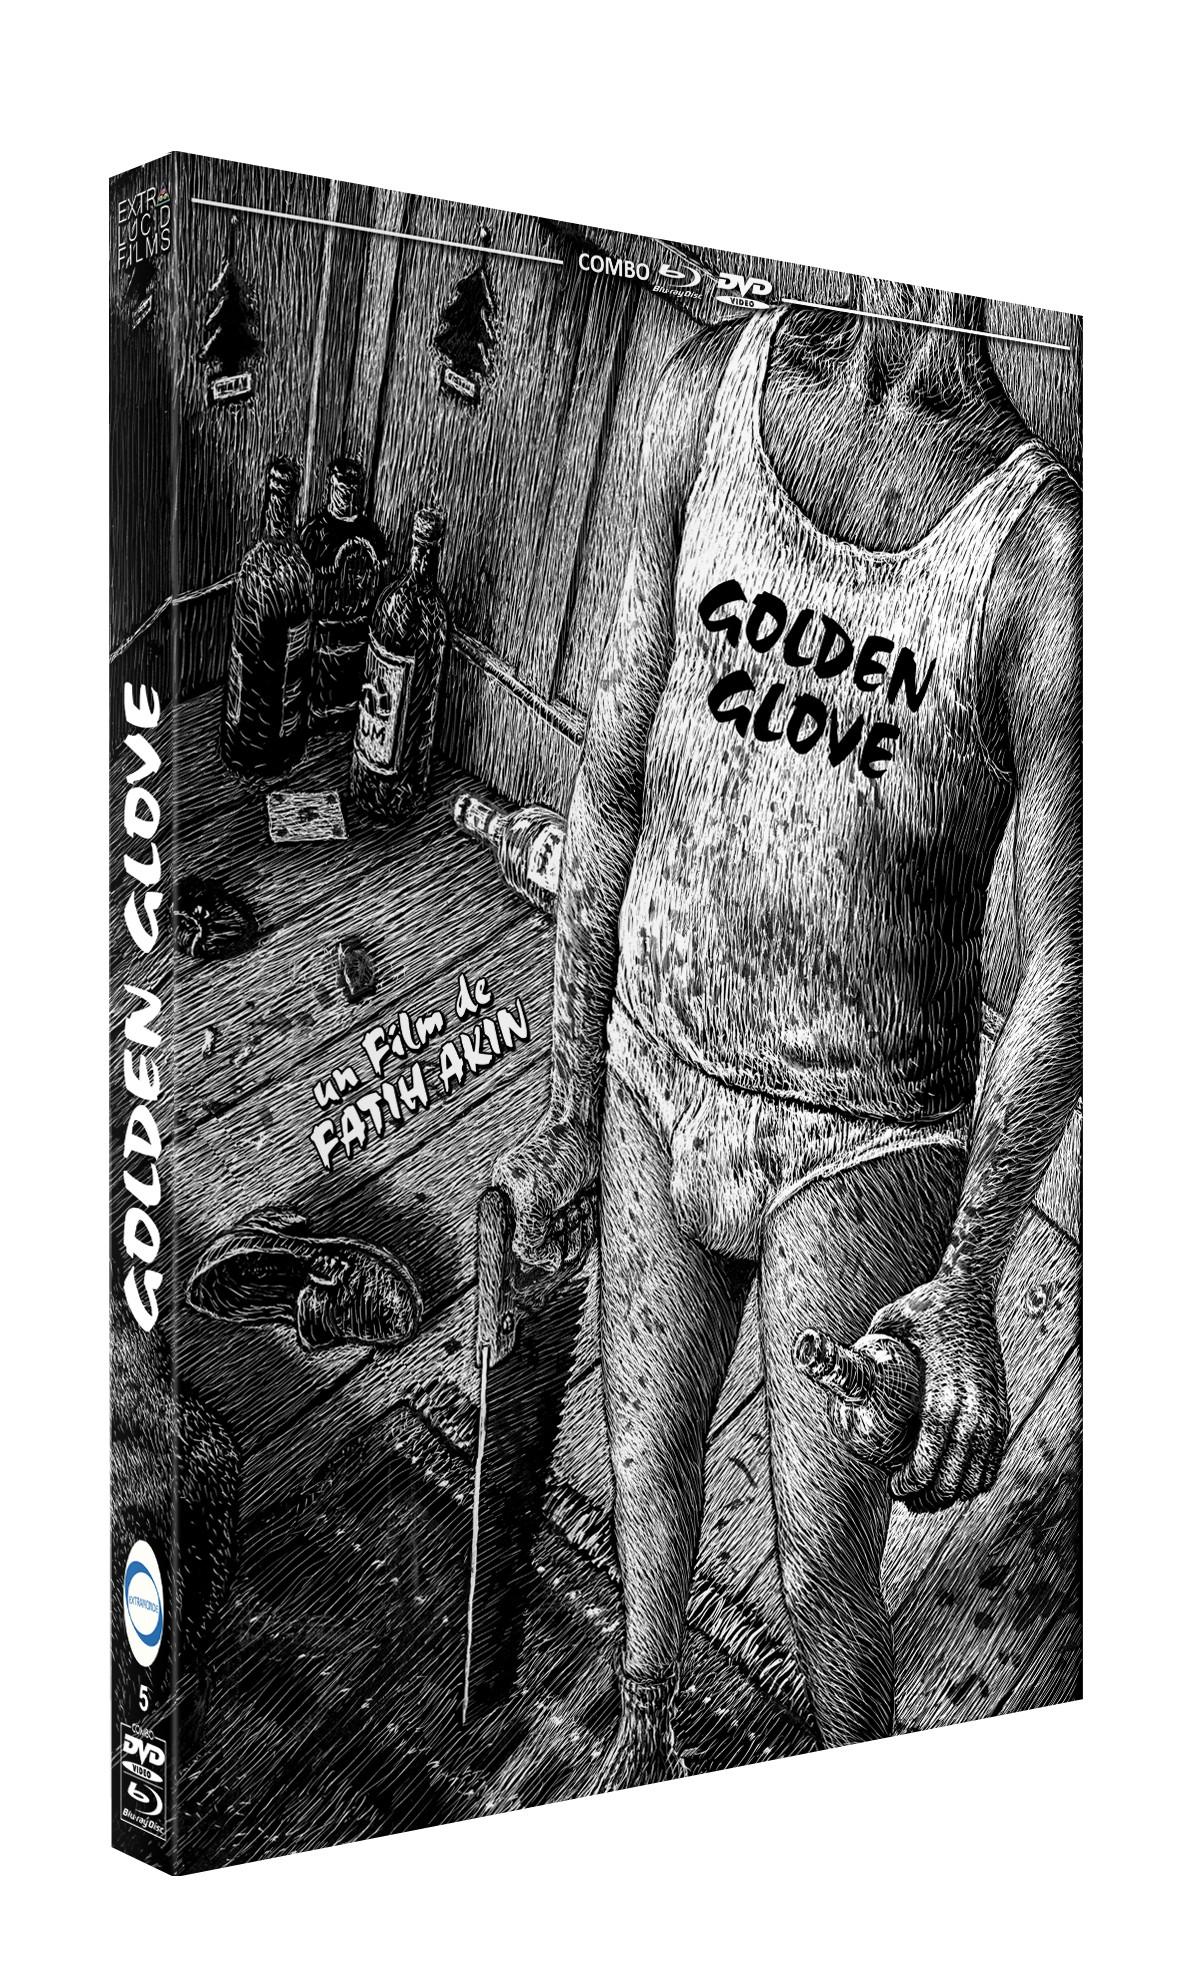 GOLDEN GLOVE - COMBO